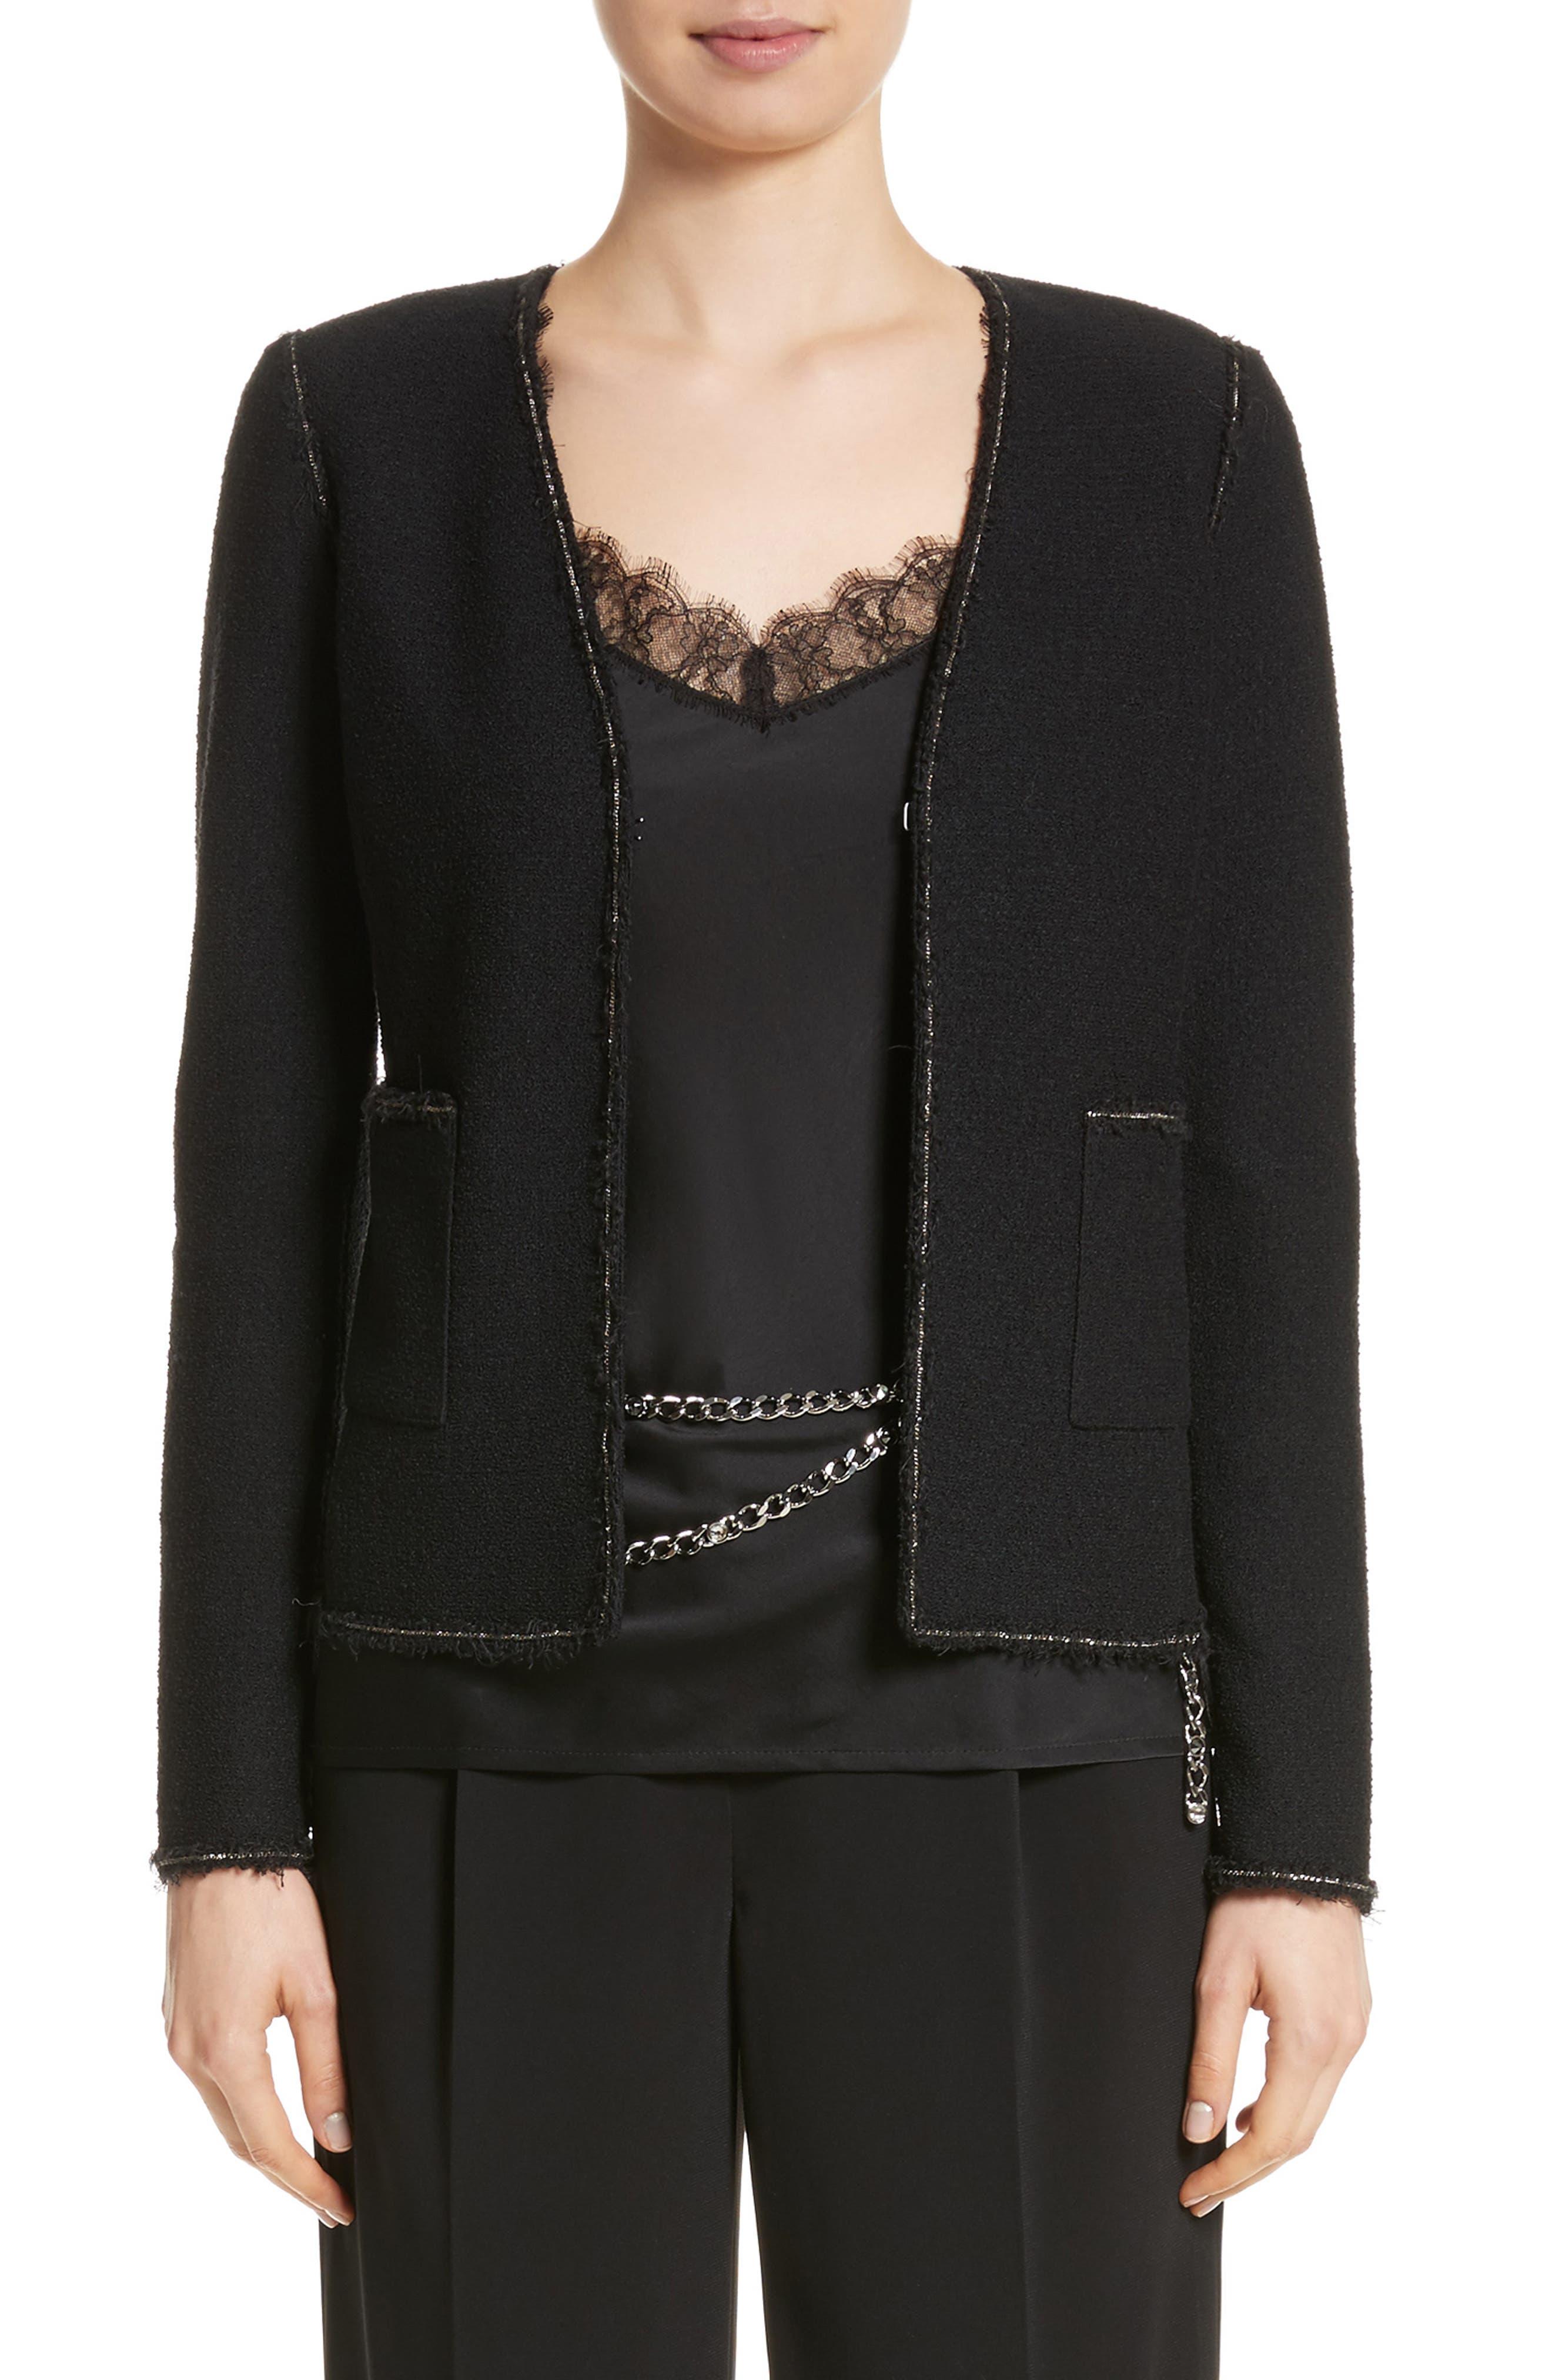 Main Image - St. John Collection Bouclé Knit Jacket